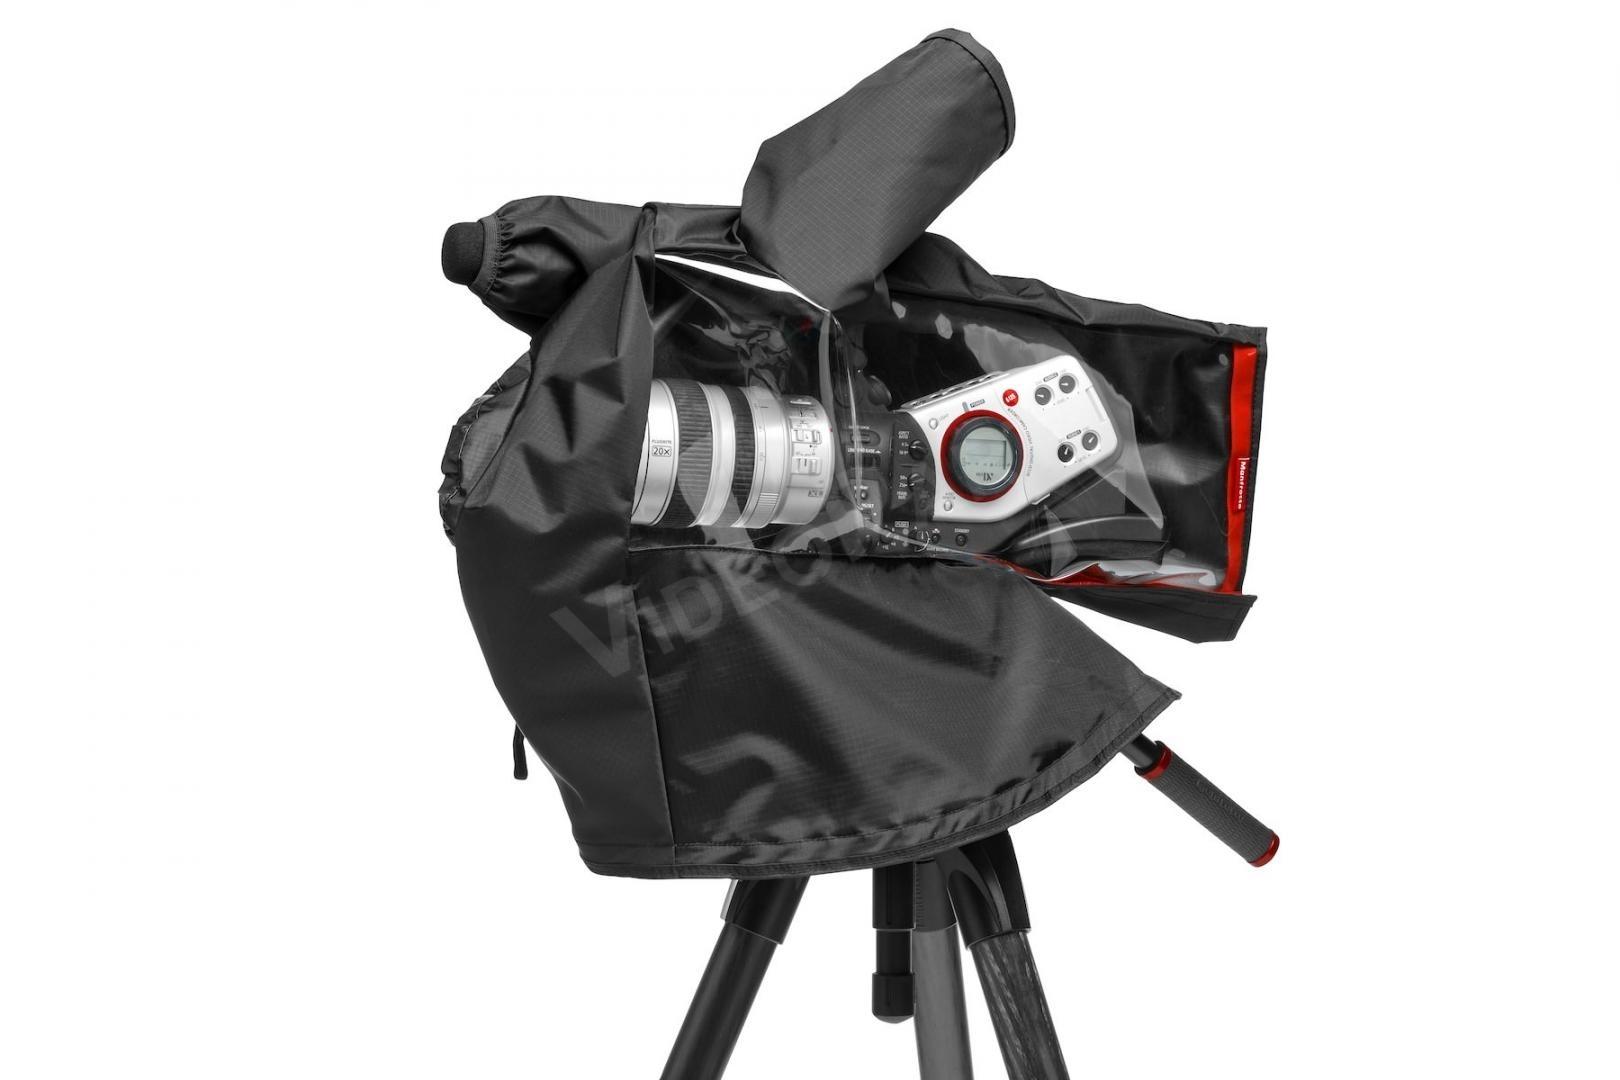 1d475ebfb311 MANFROTTO MB PL-CRC-12 Pro light CRC-12 kamera esőhuzat Hordtáska ...